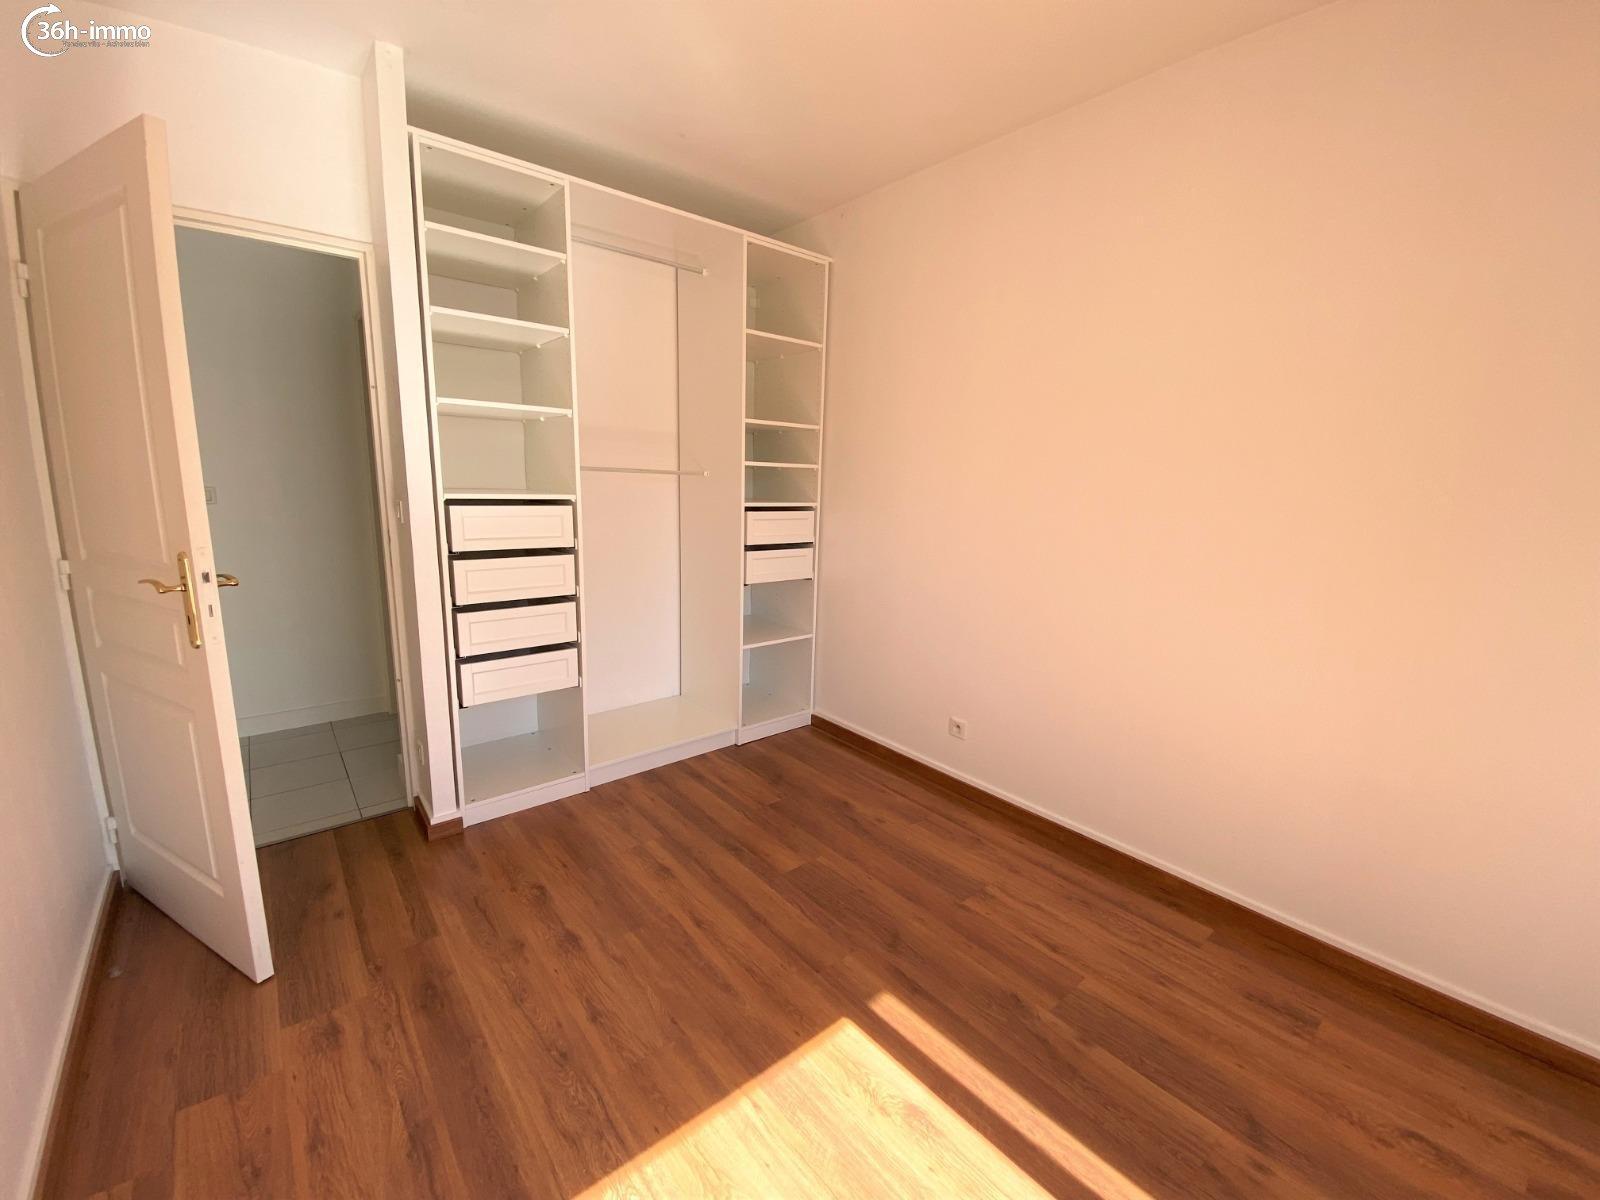 Appartement Saujon 17600 Charente-Maritime 94 m<sup>2</sup> 4 pi&eagrave;ces 210000 euros